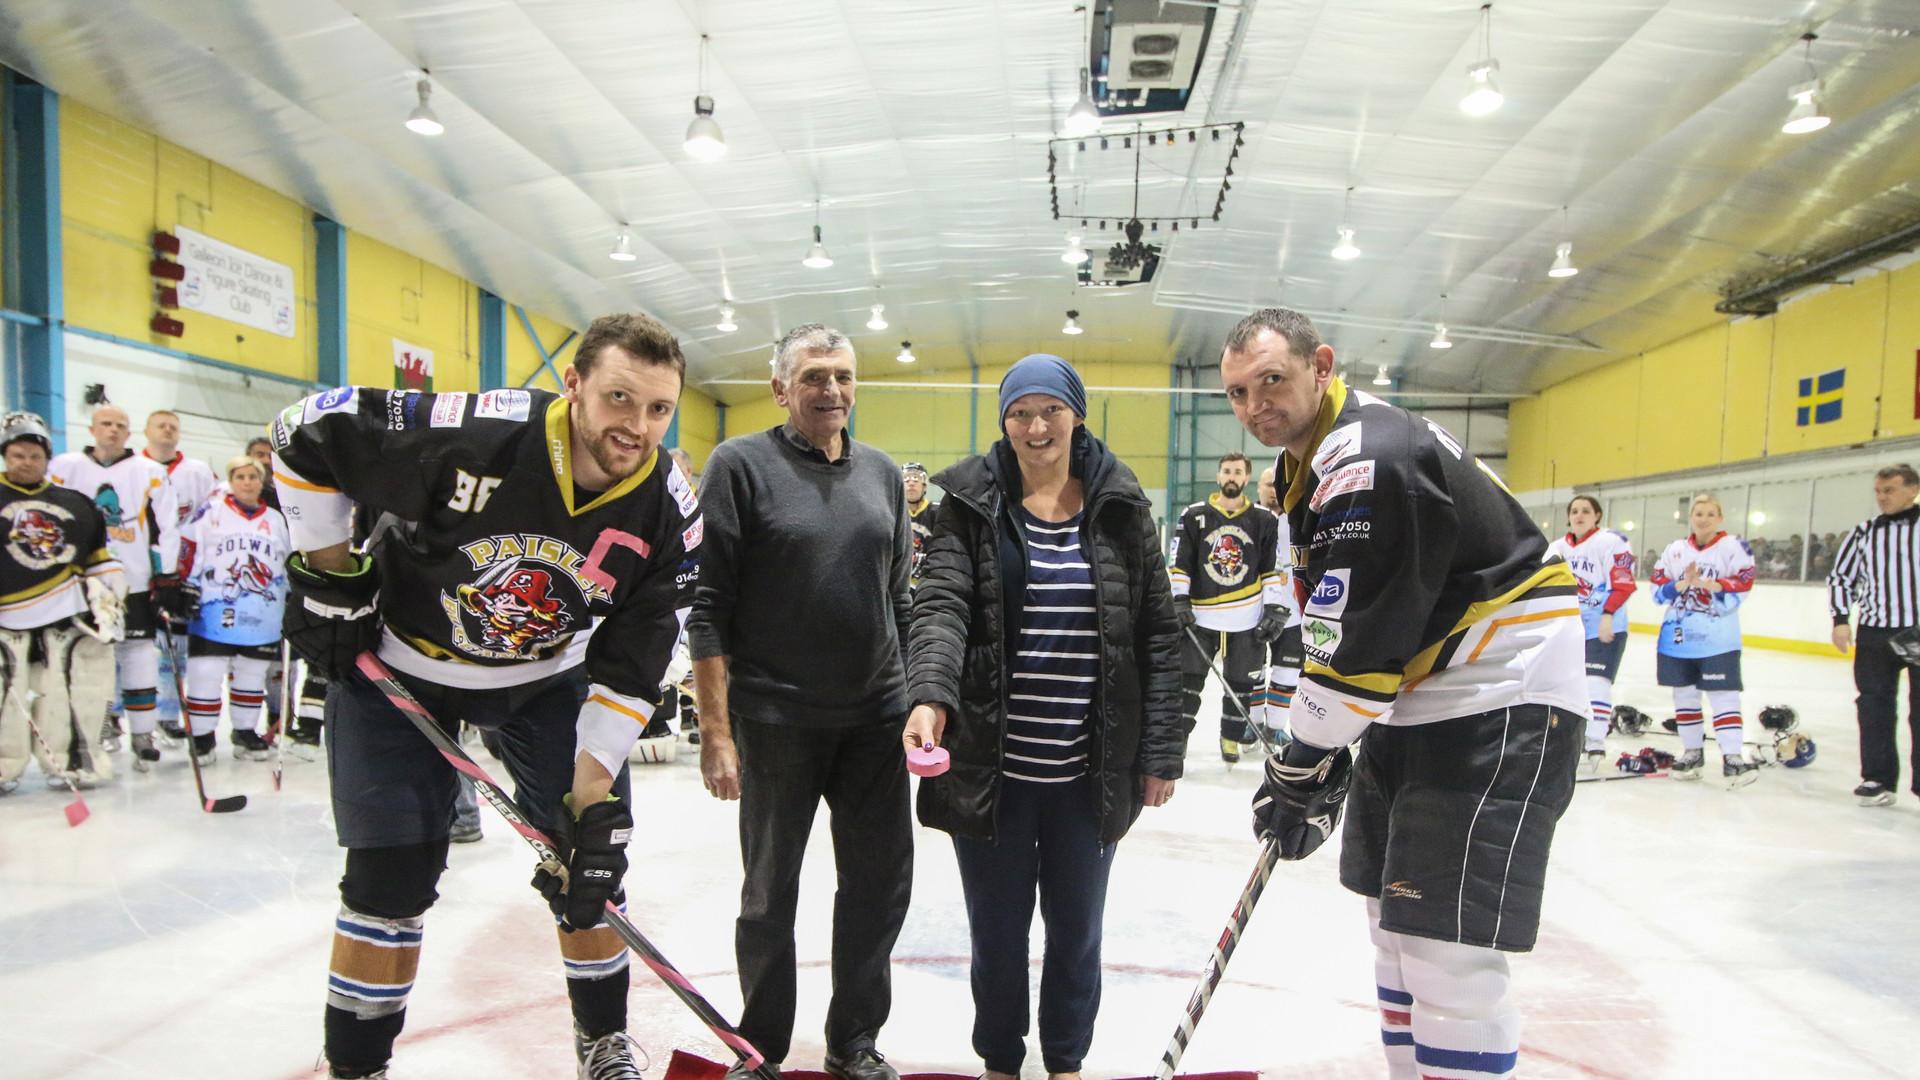 Lesley Graham Ice Hockey Fundraiser (6 o